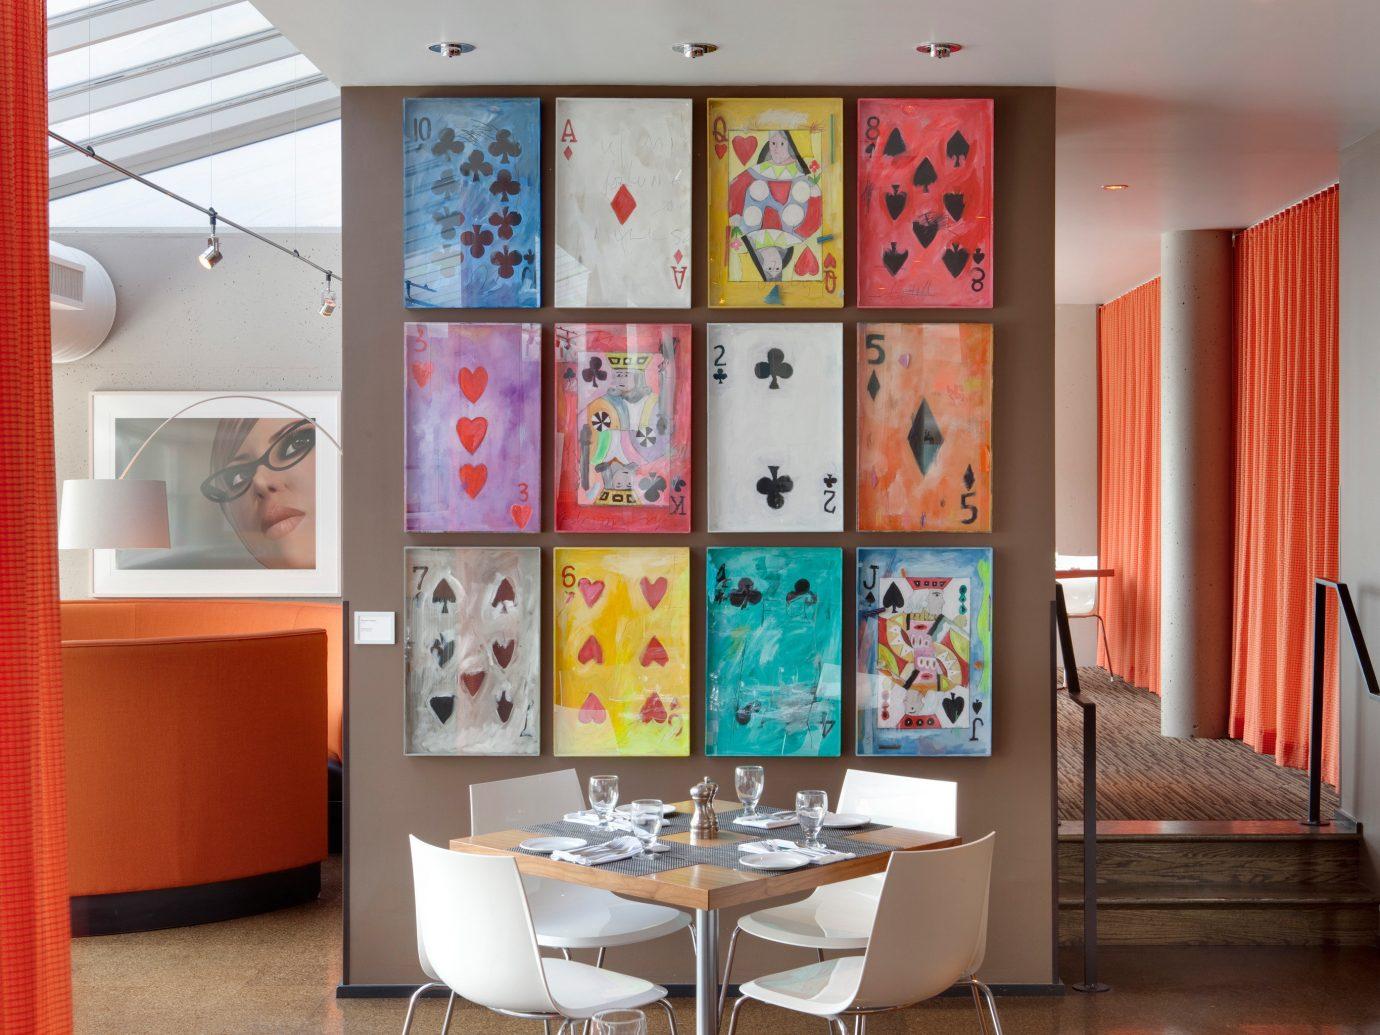 Secret Getaways Trip Ideas indoor wall floor room living room red interior design art home dining room furniture Design office window covering orange area